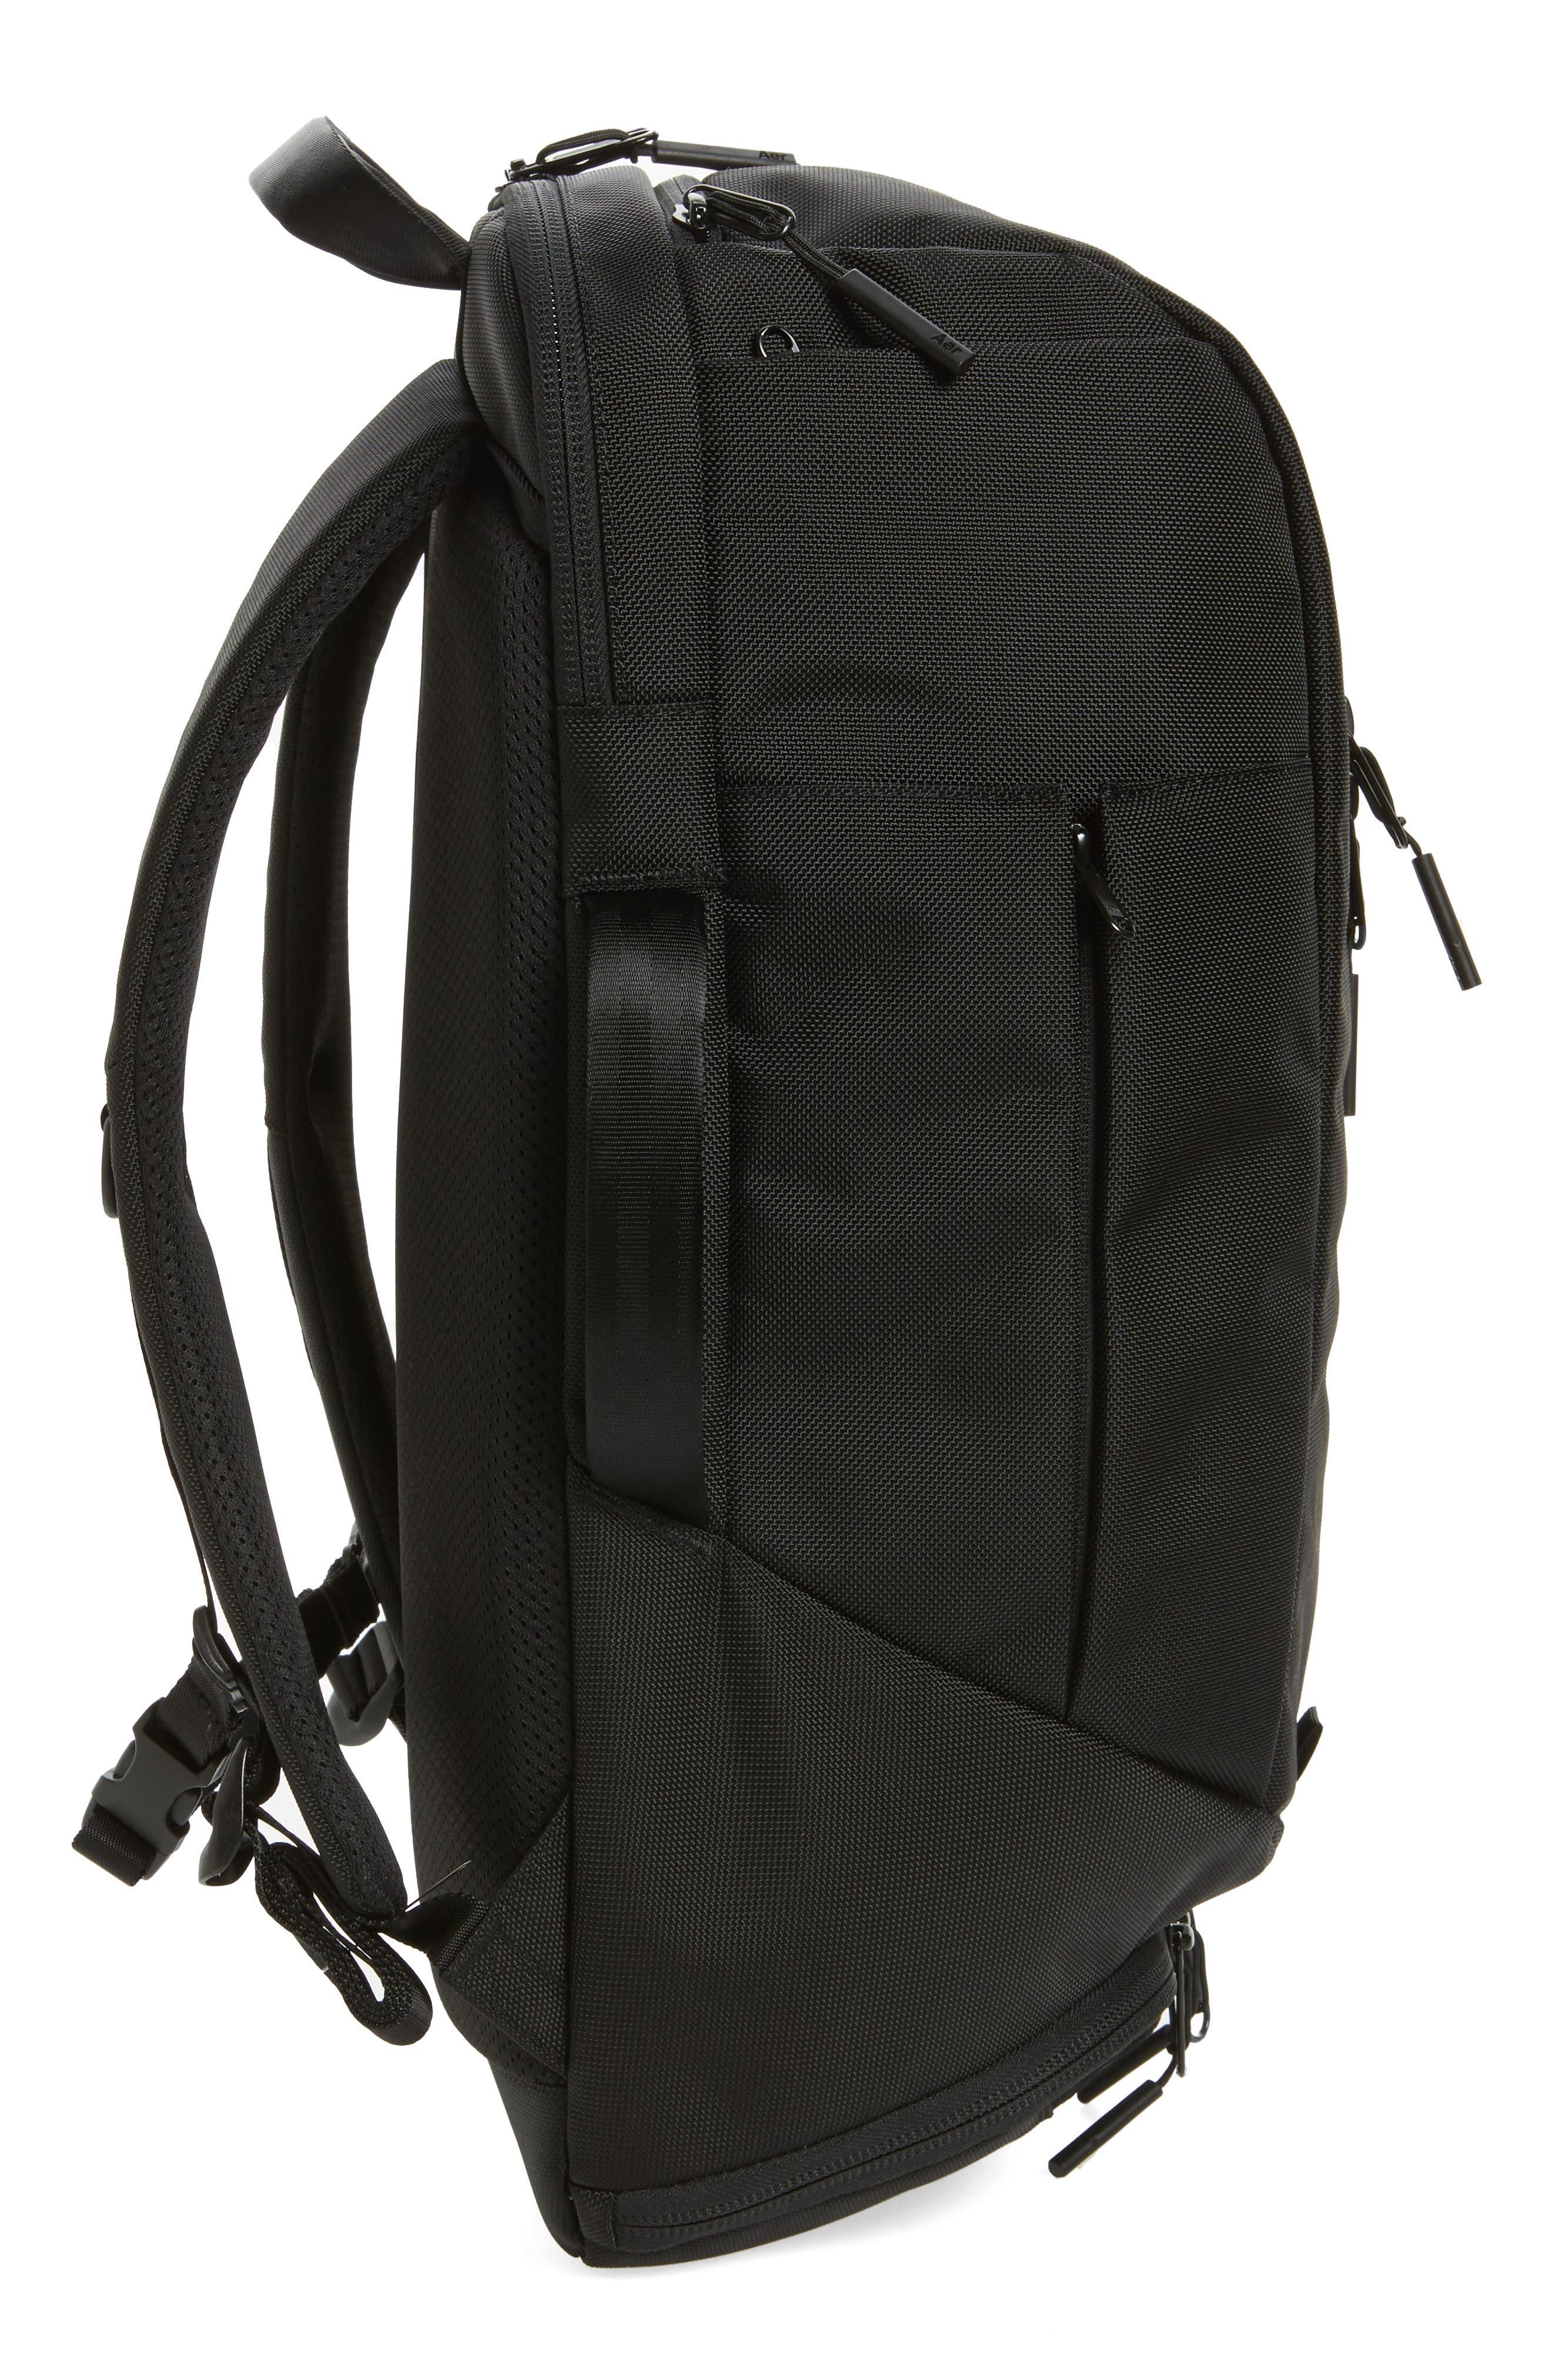 Duffel Pack 2 Convertible Backpack,                             Alternate thumbnail 5, color,                             BLACK